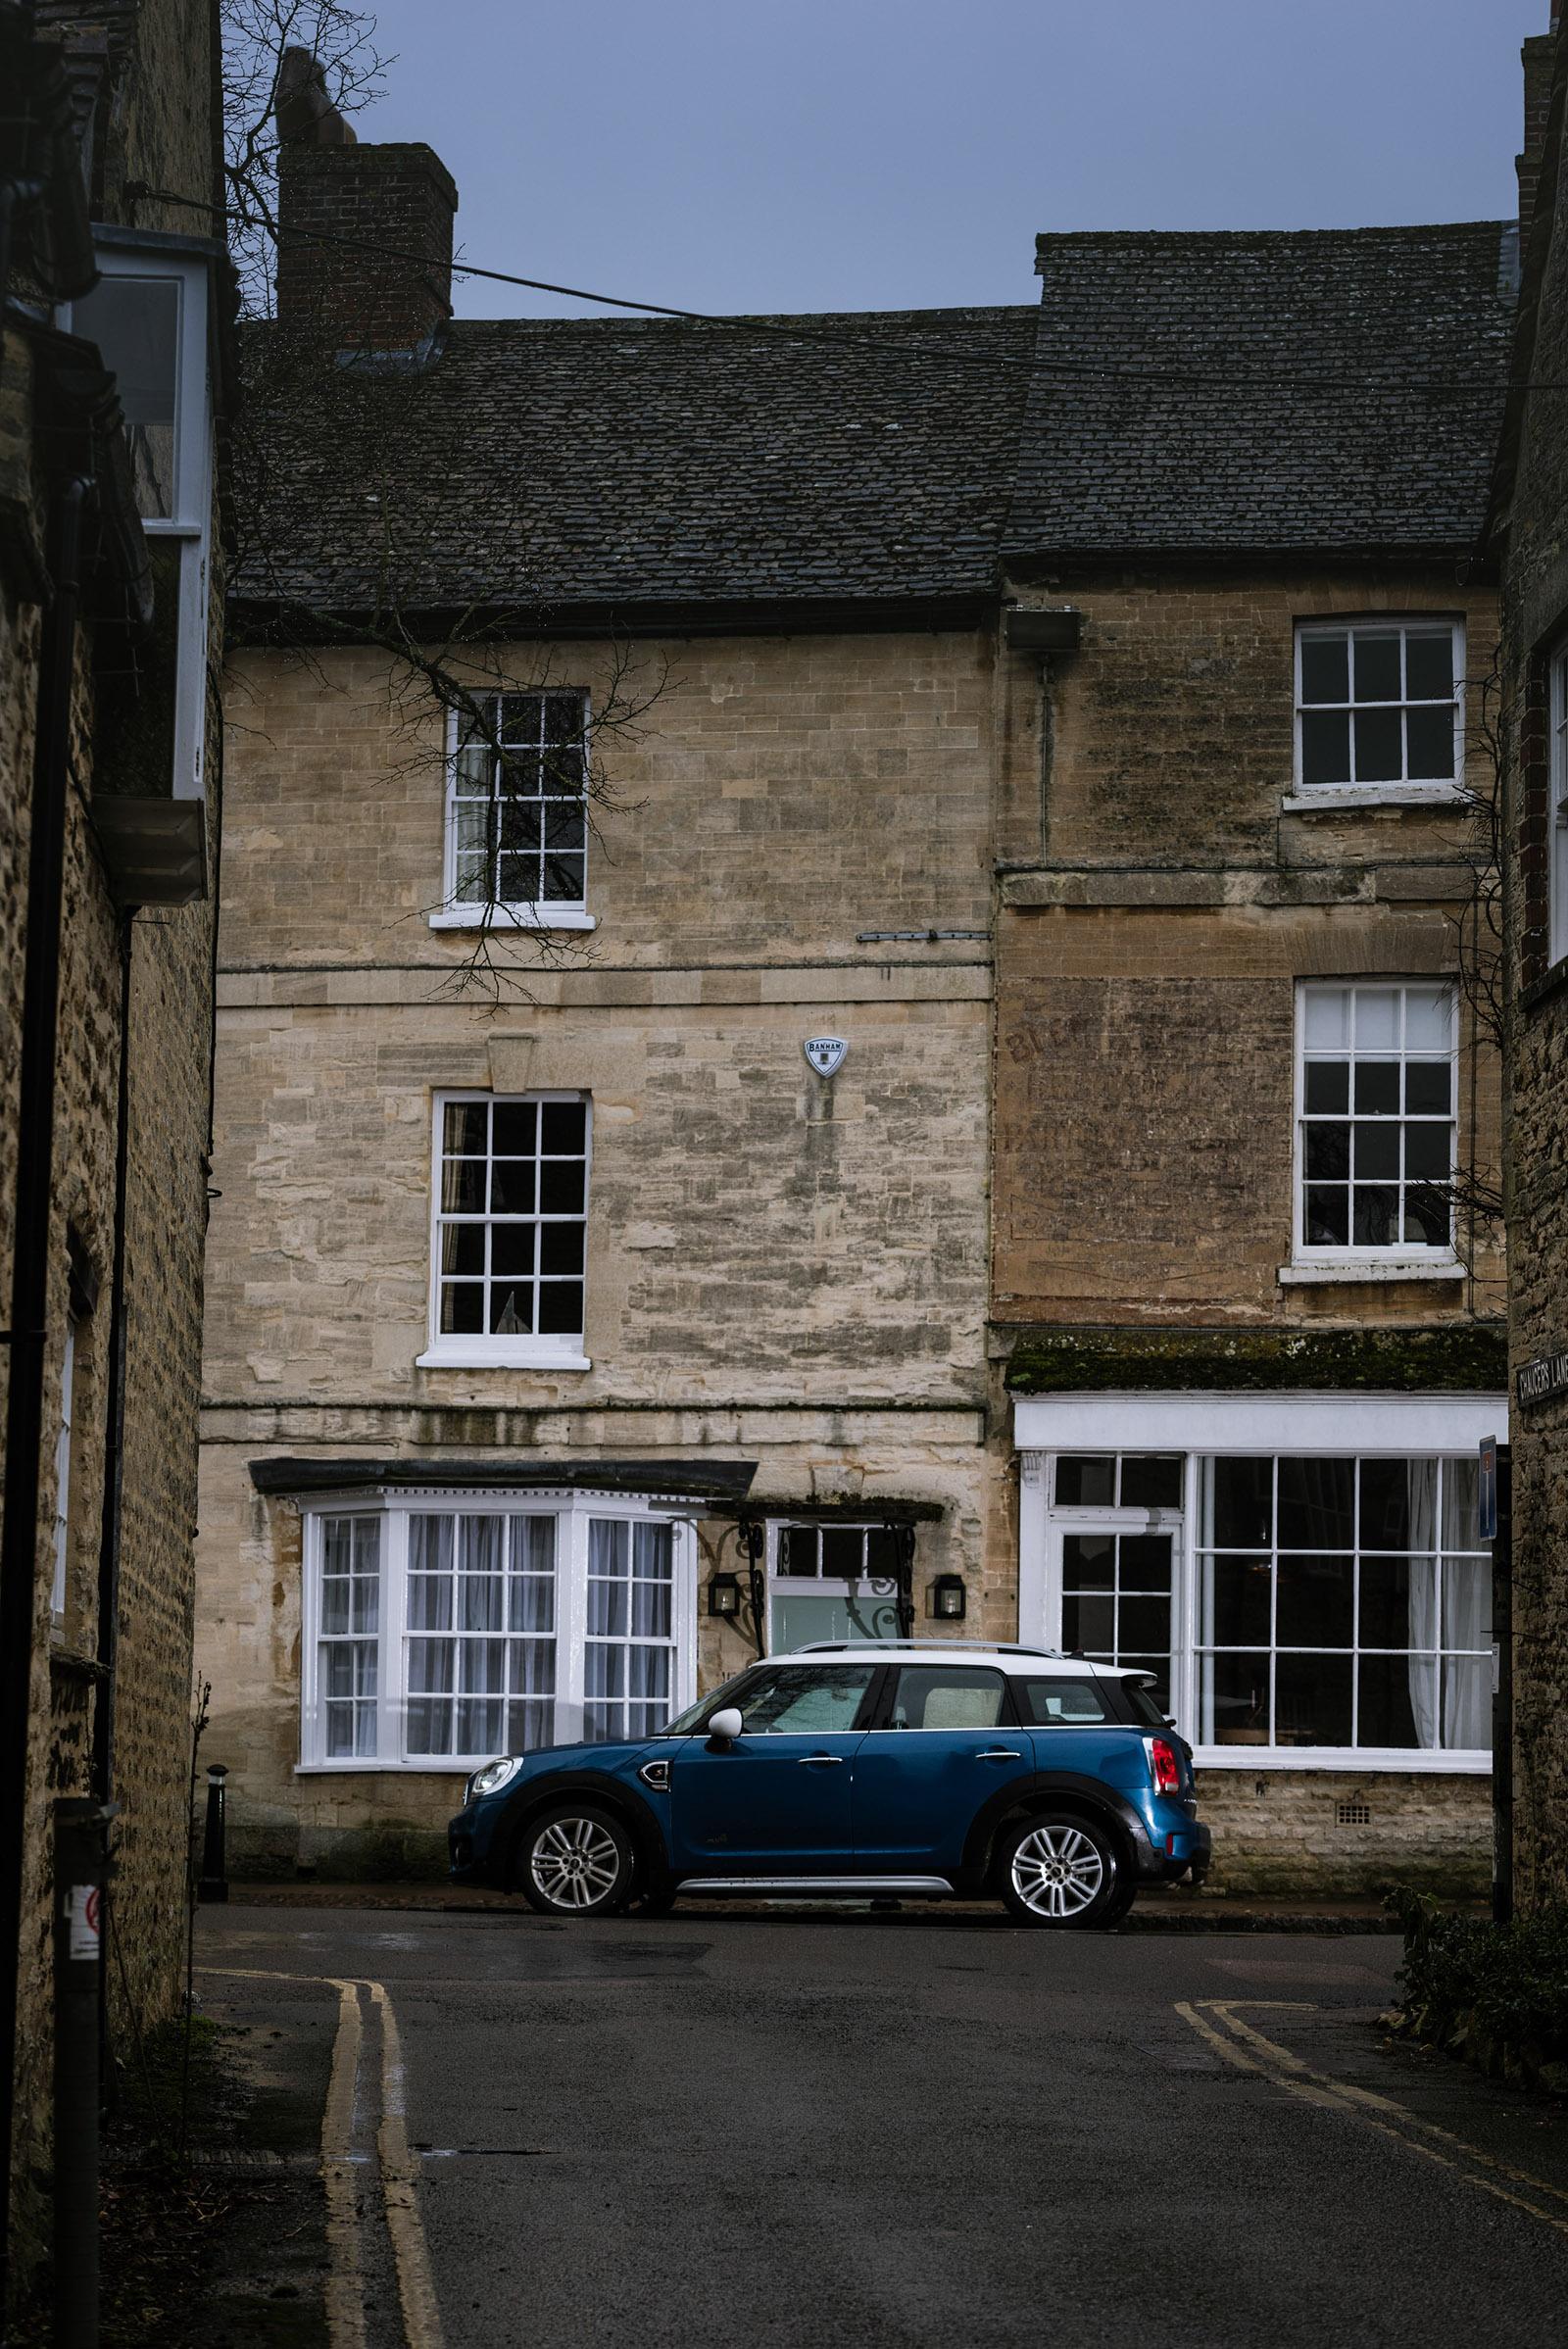 Picknick in Oxfordshire: Unterwegs mit dem neuen MINI Countryman 4